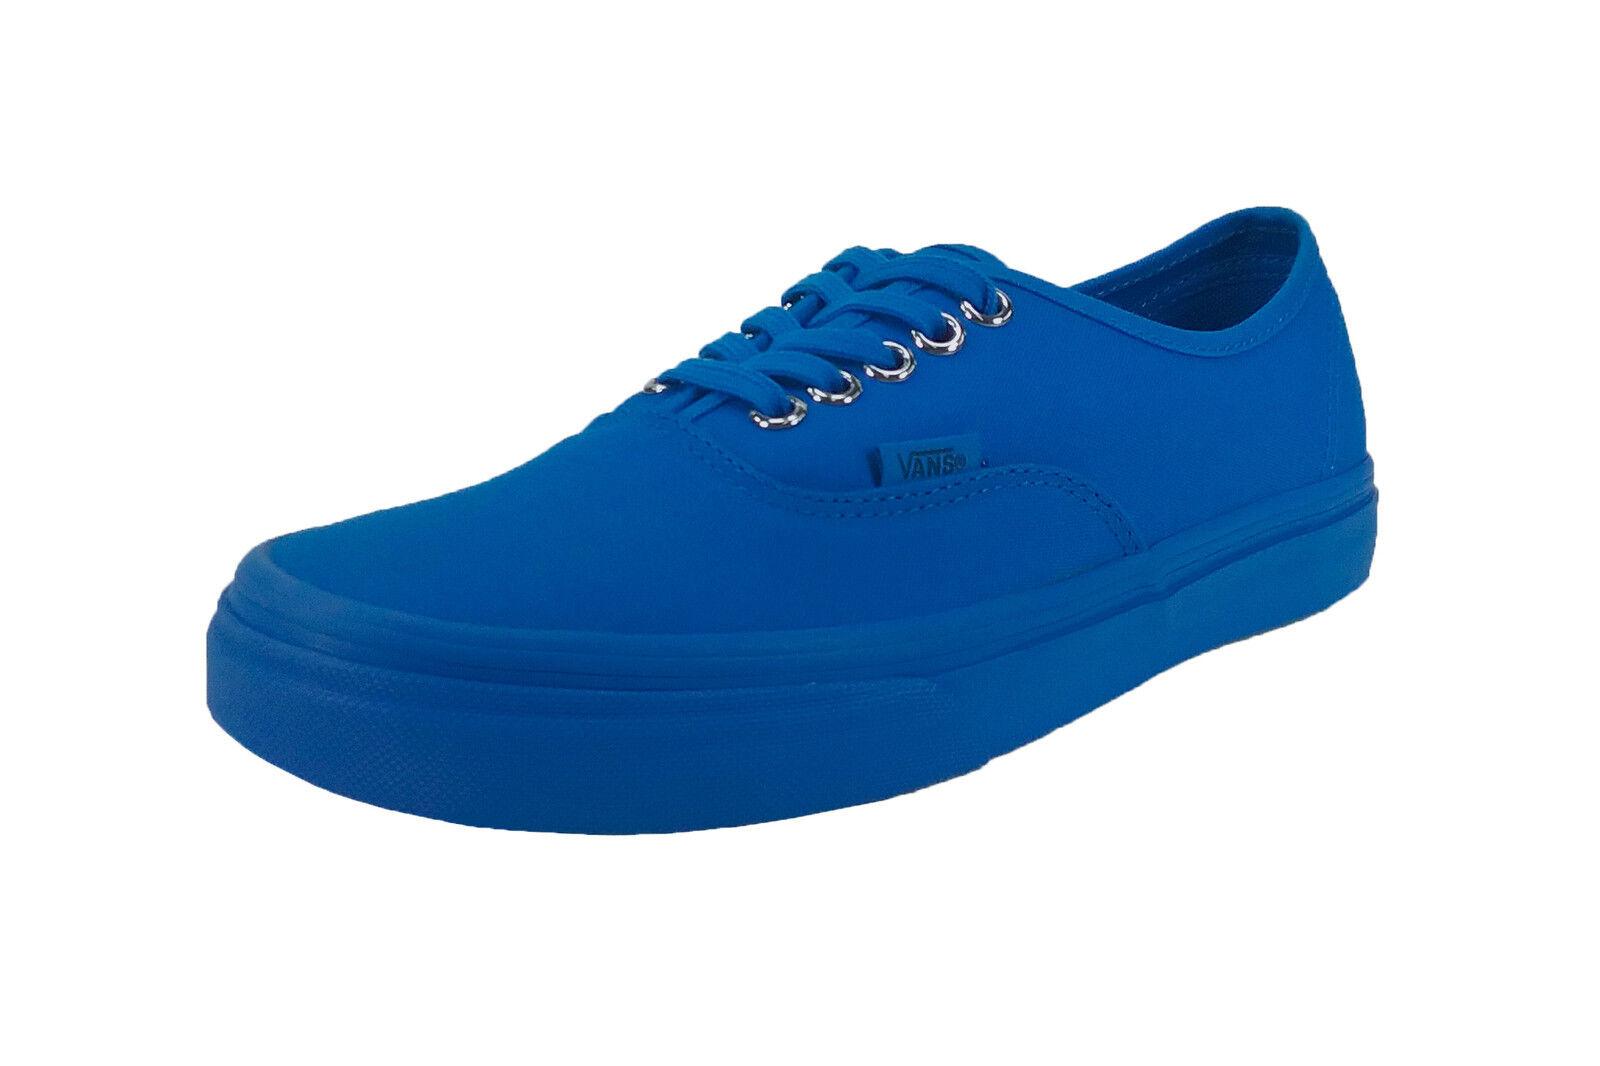 Vans Unisex Mono Men Damens Schuhes Authentic Primary Mono Unisex Canvas Imperial Blau b8e9b2